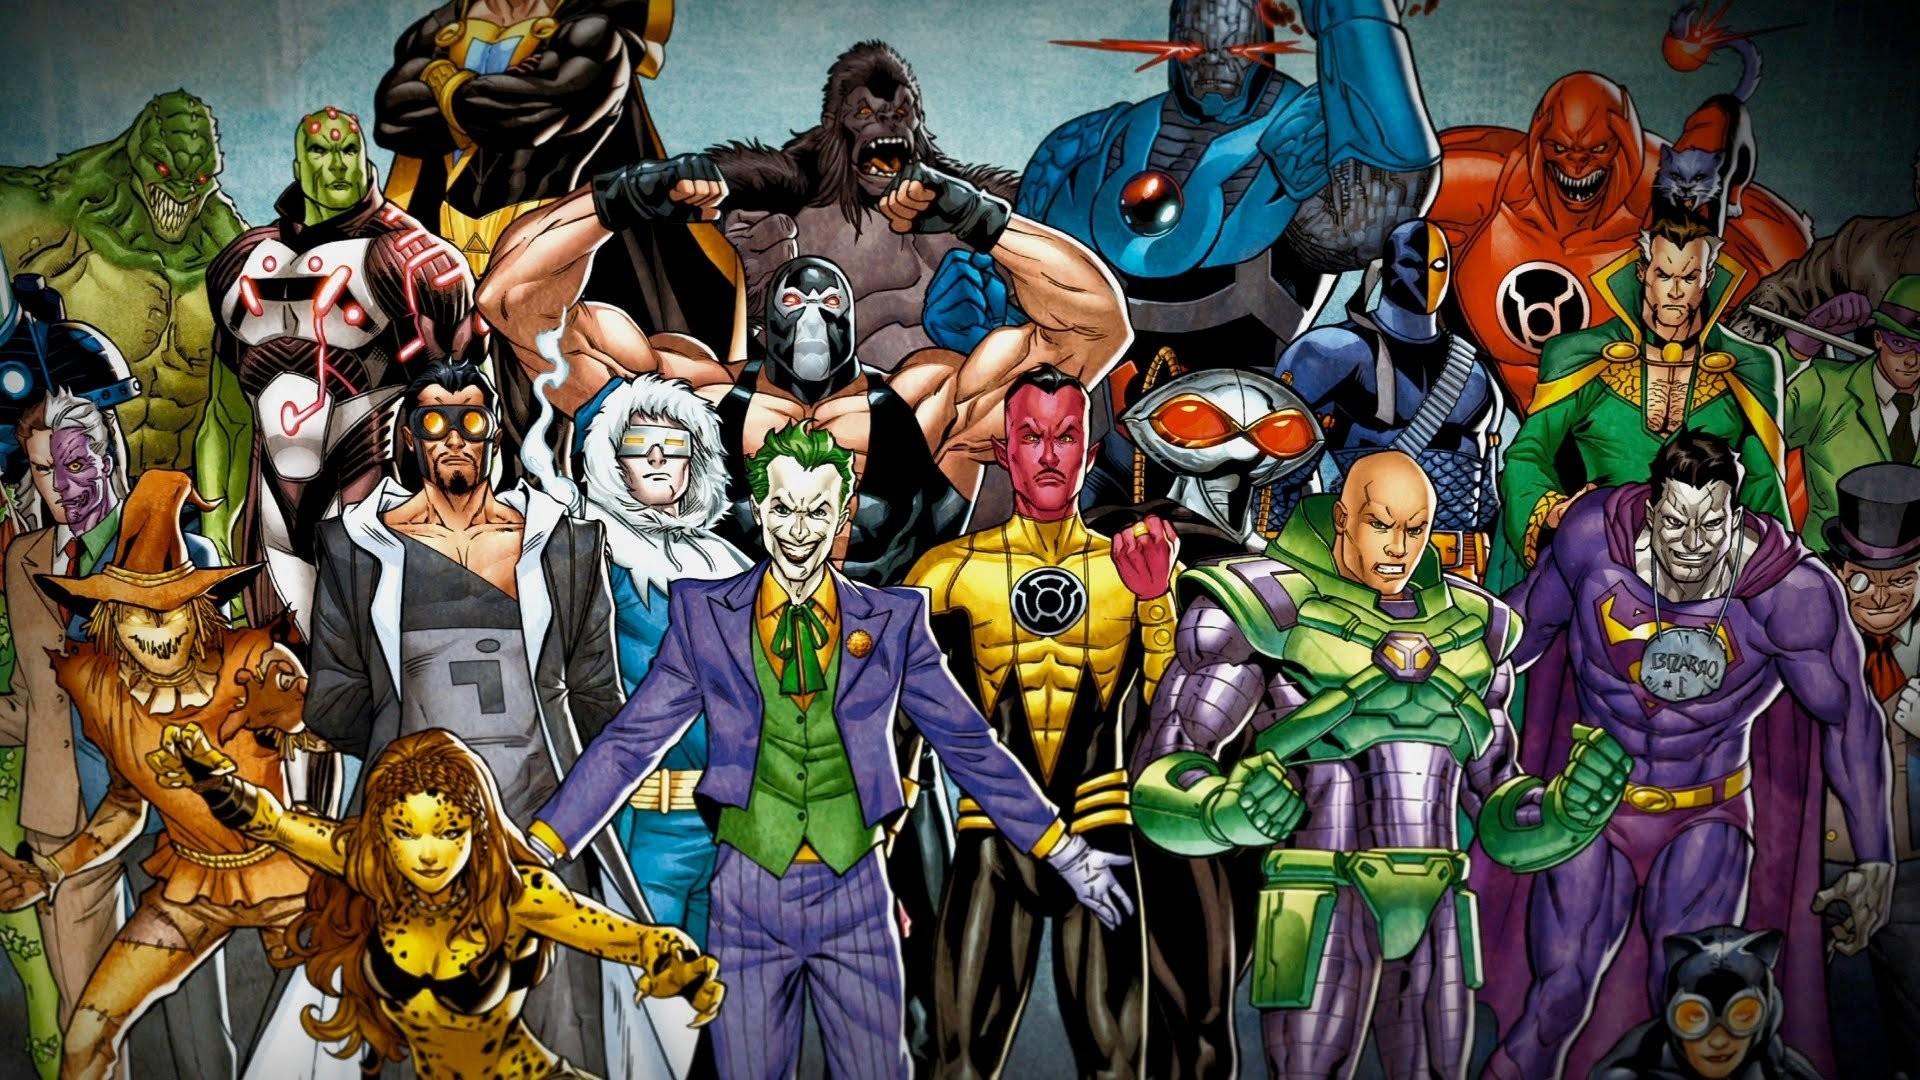 SUICIDE SQUAD action superhero dc-comics d-c action fighting mystery comics  harley quinn joker wallpaper